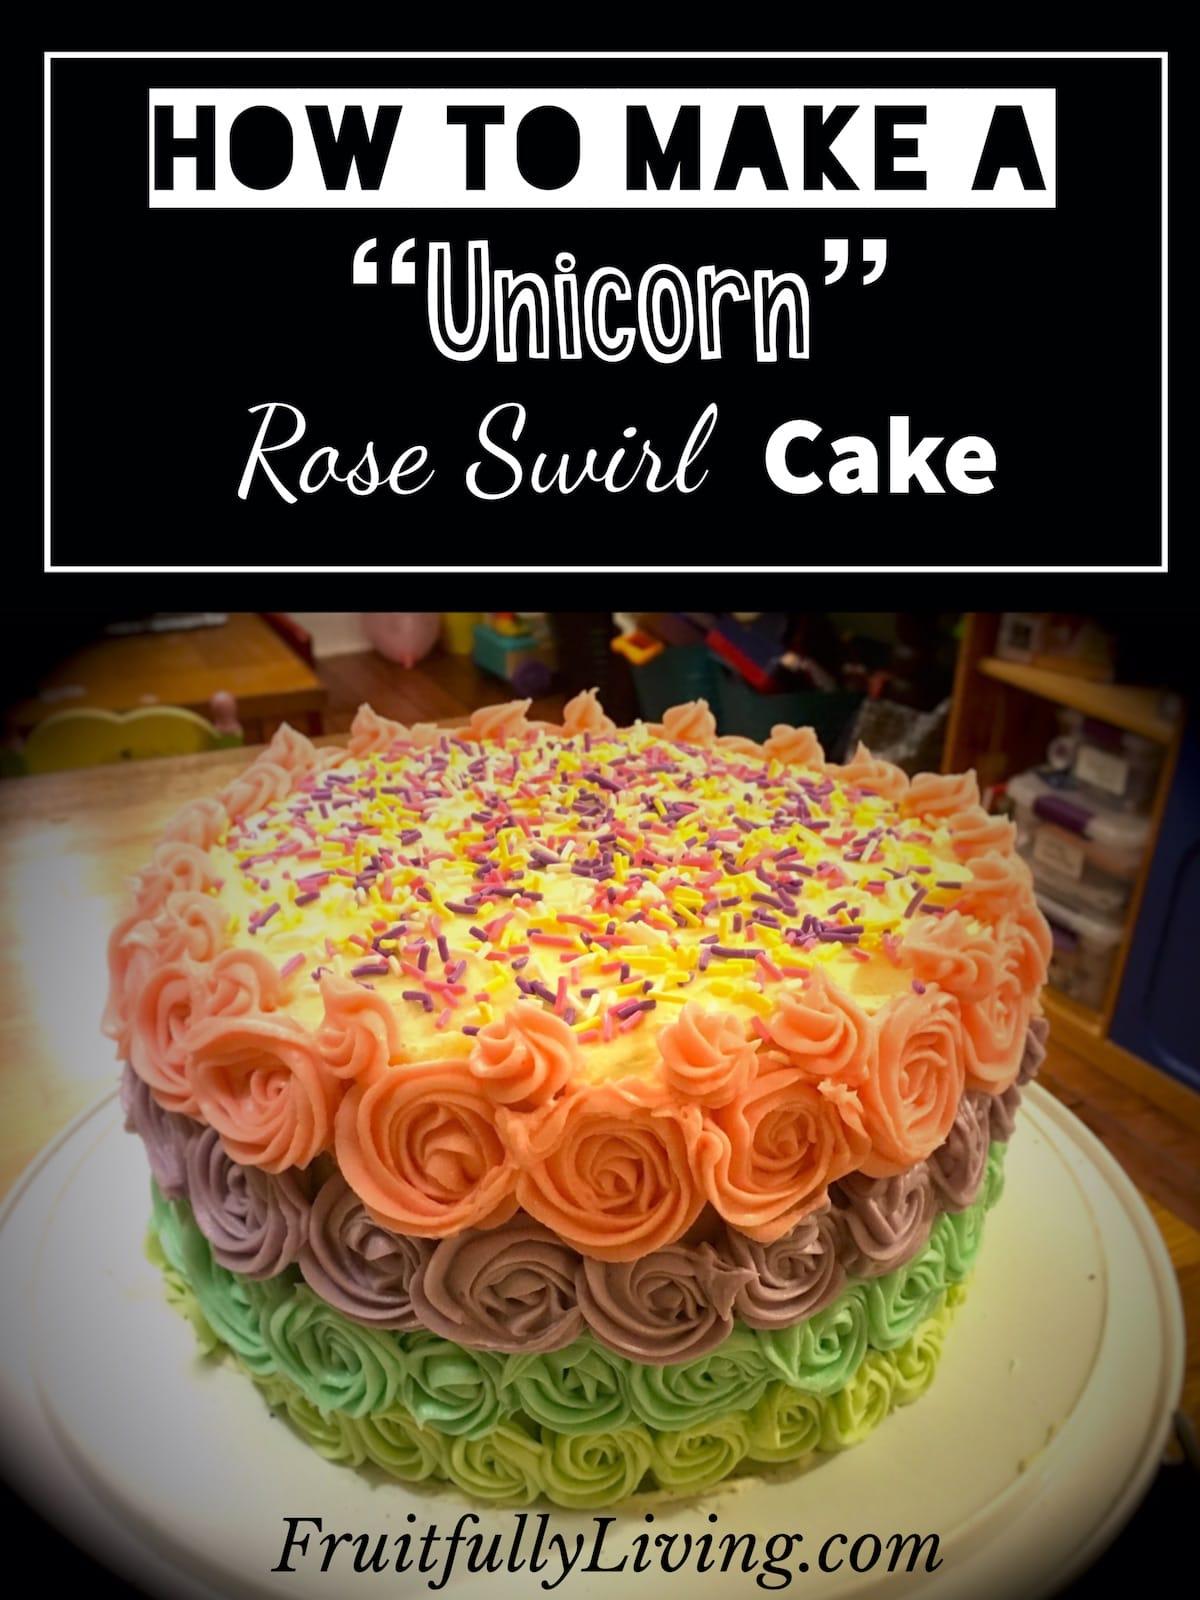 How to Make a Rose Swirl Cake Image